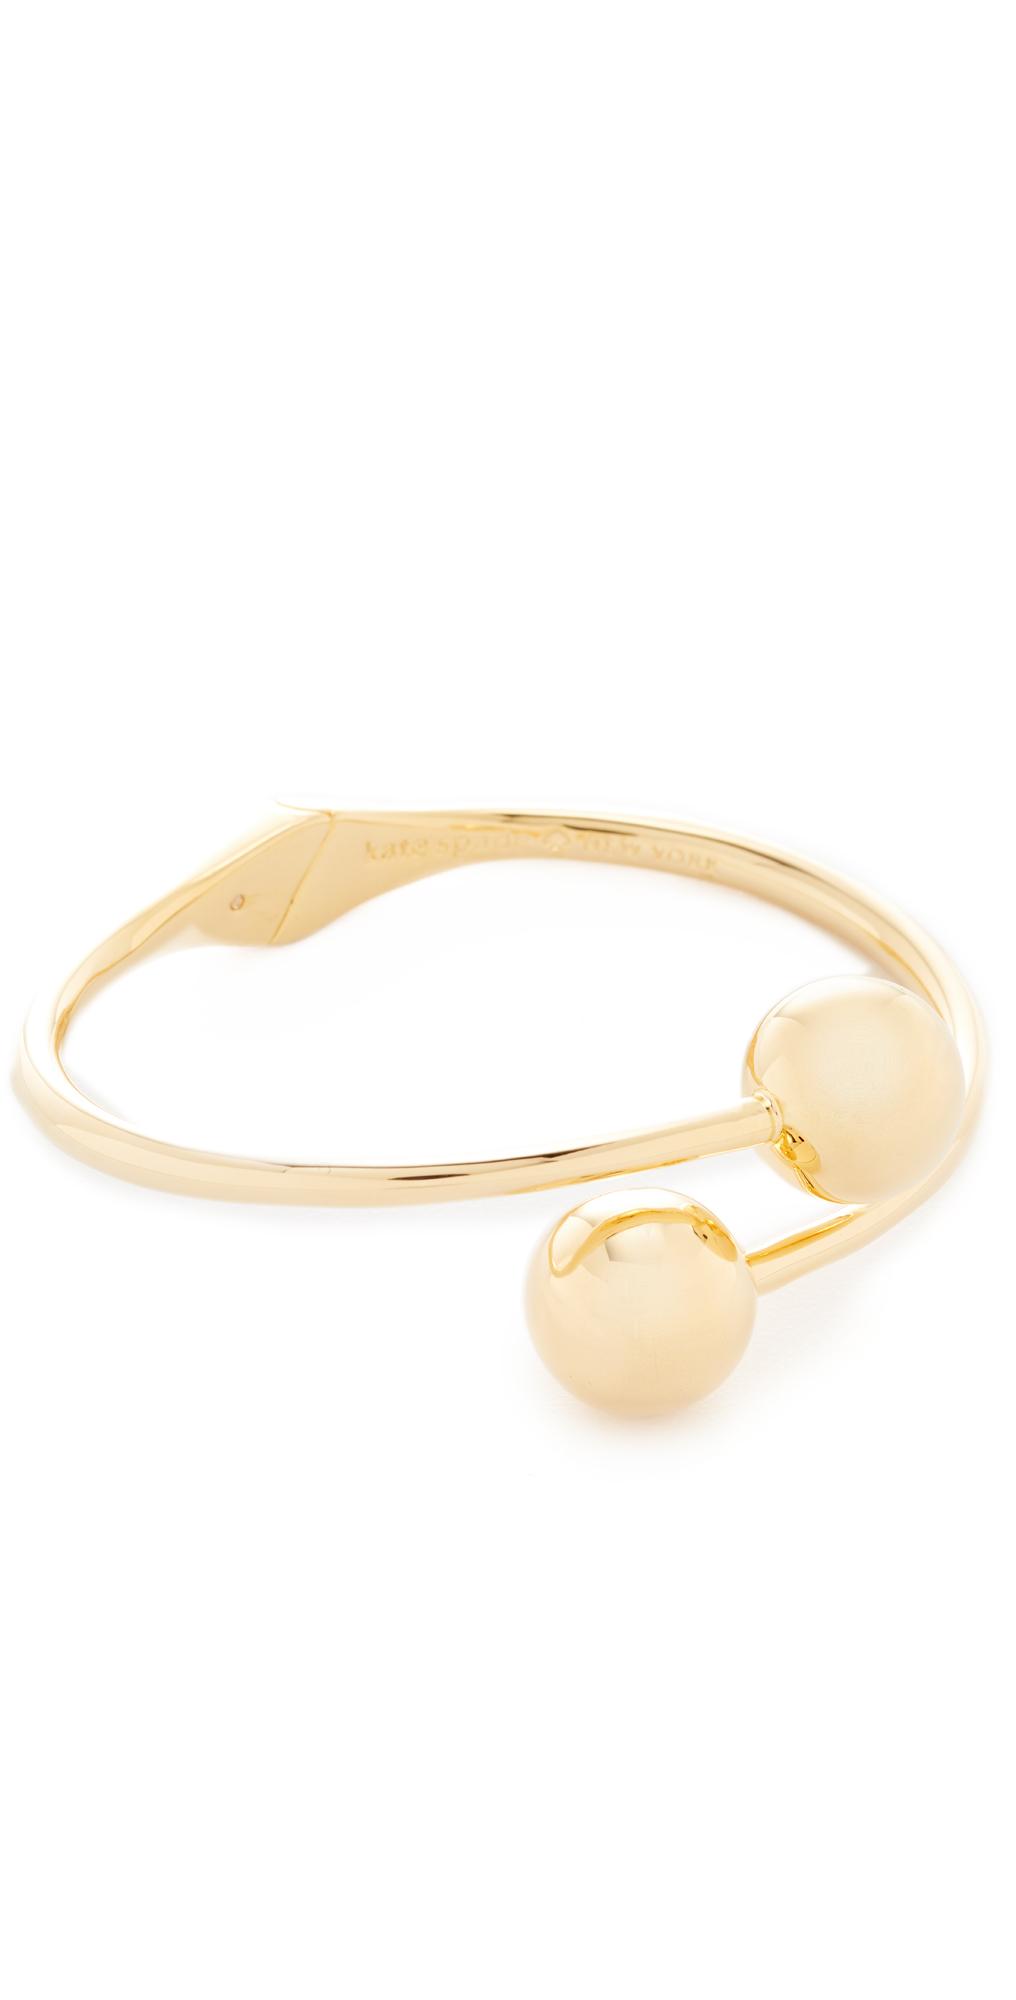 Bauble Cuff Bracelet Kate Spade New York